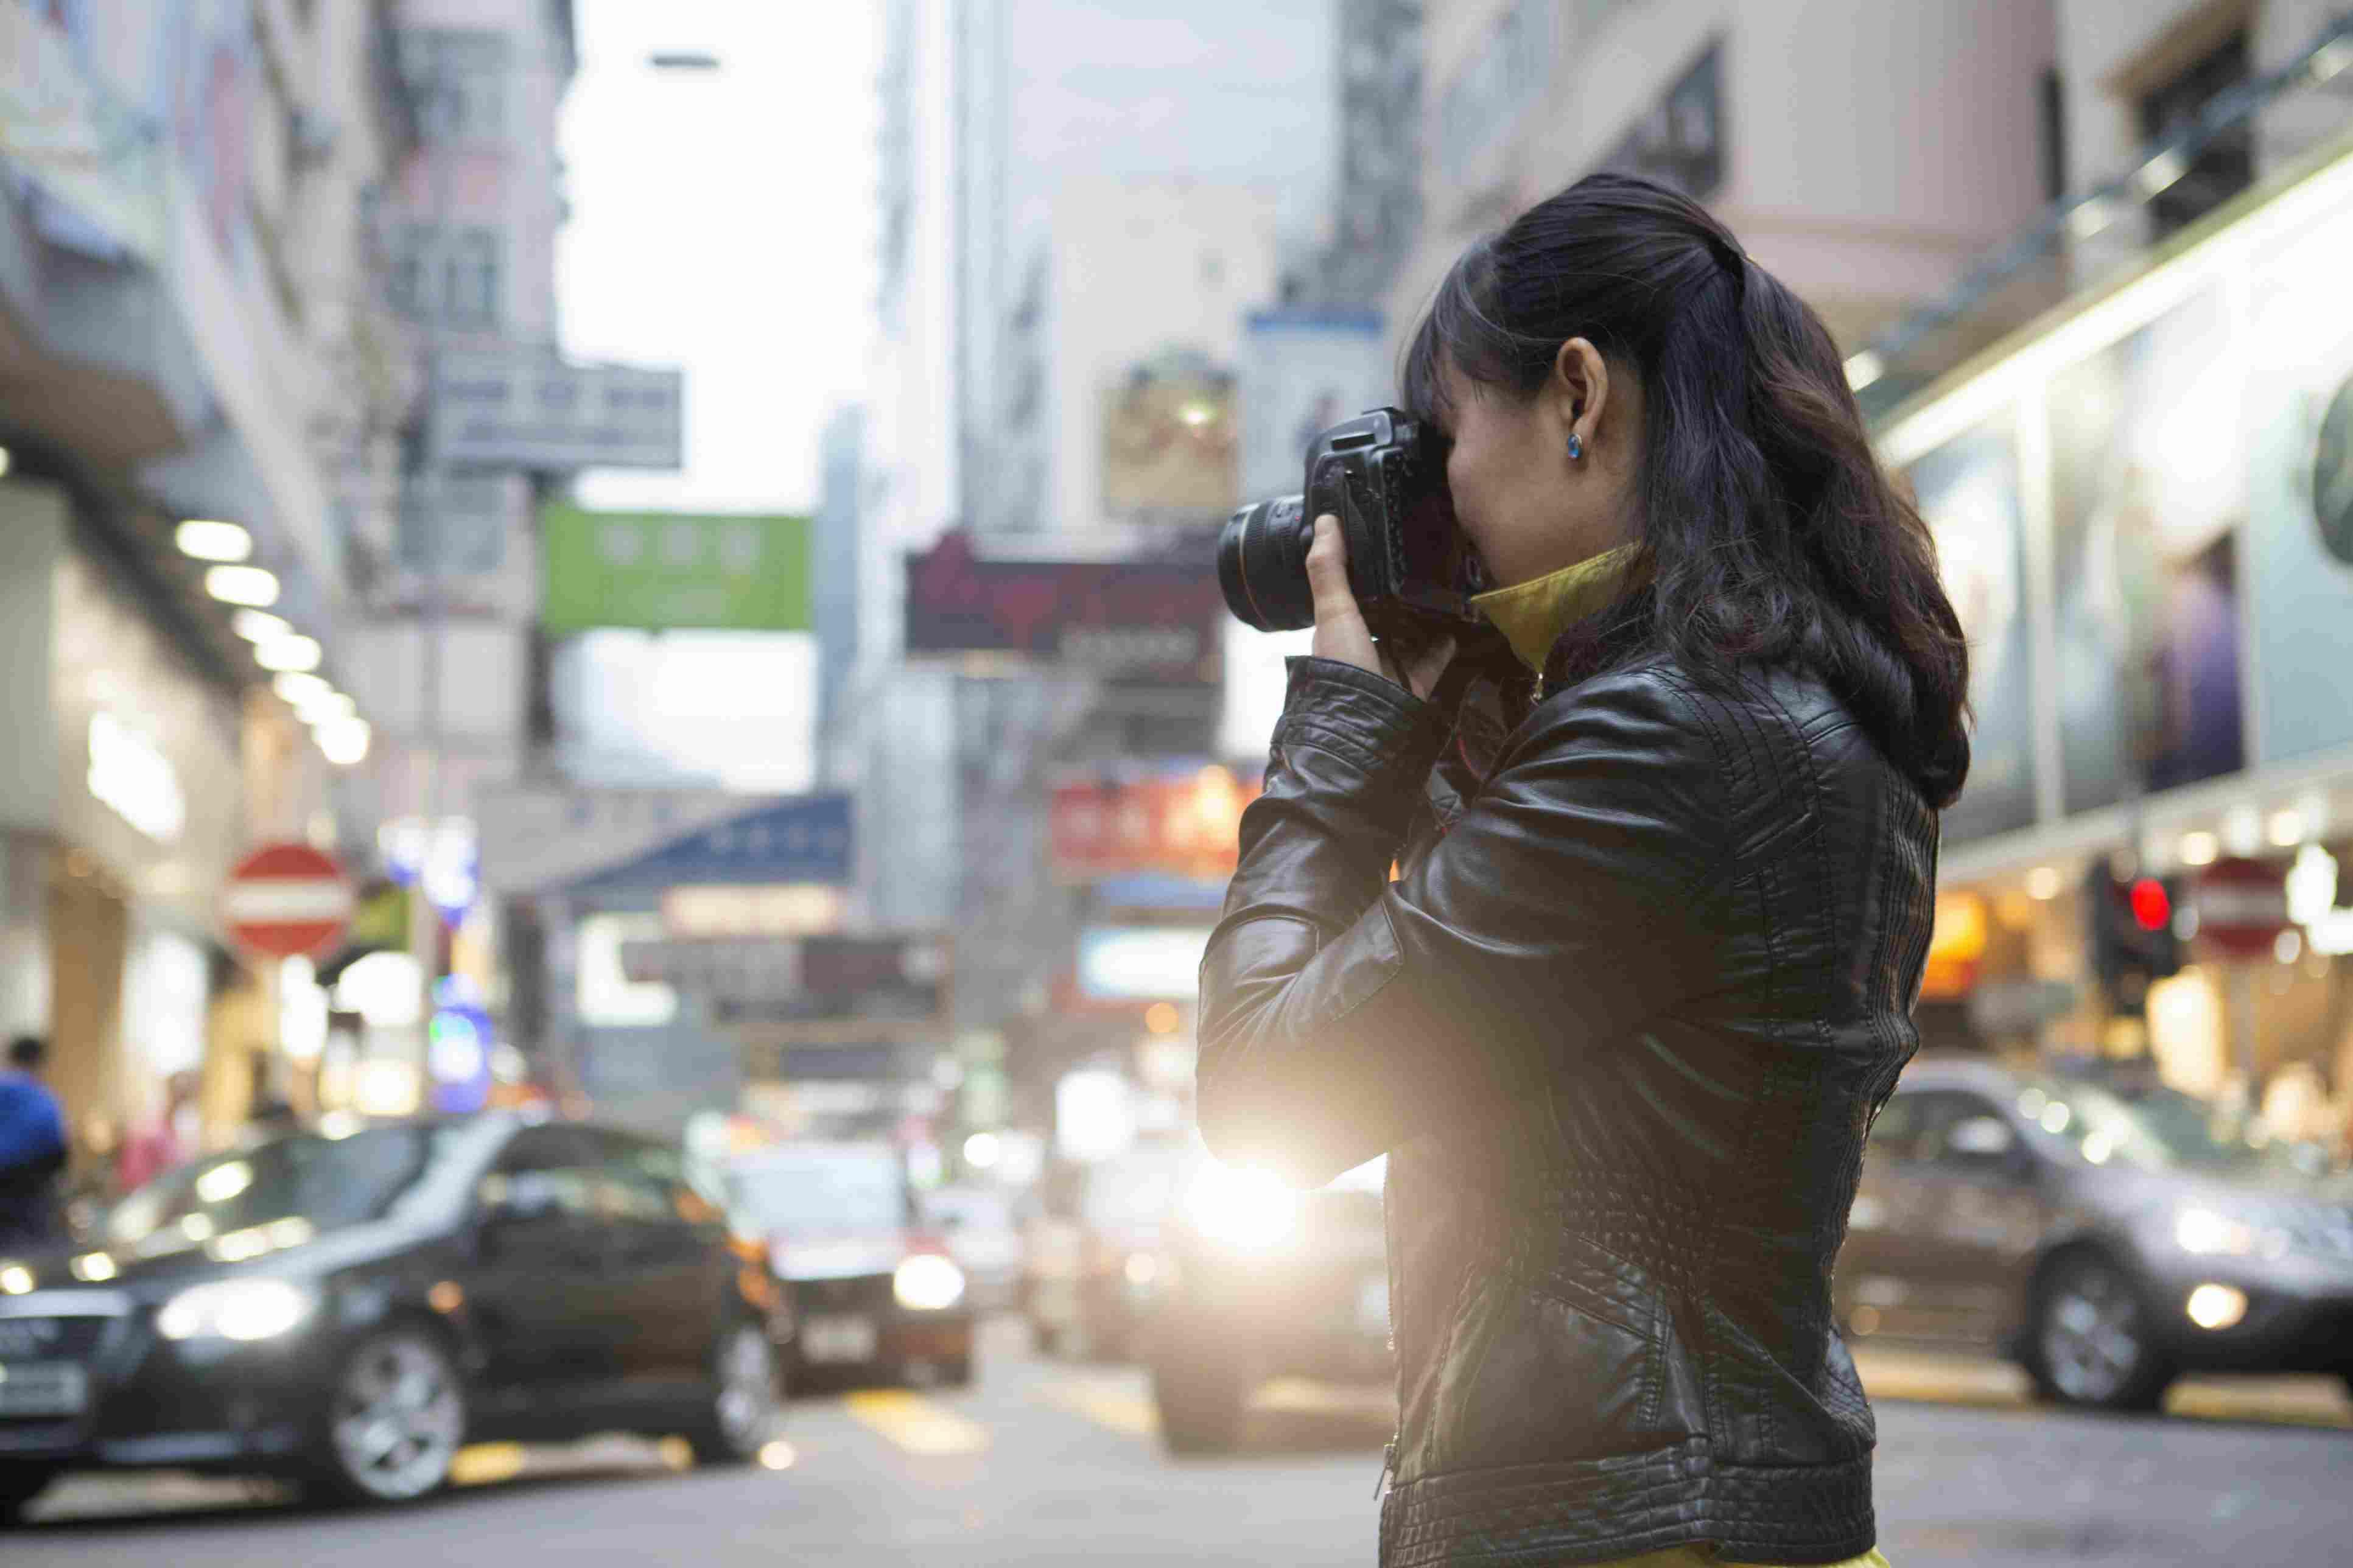 Portrait of woman using digital camera